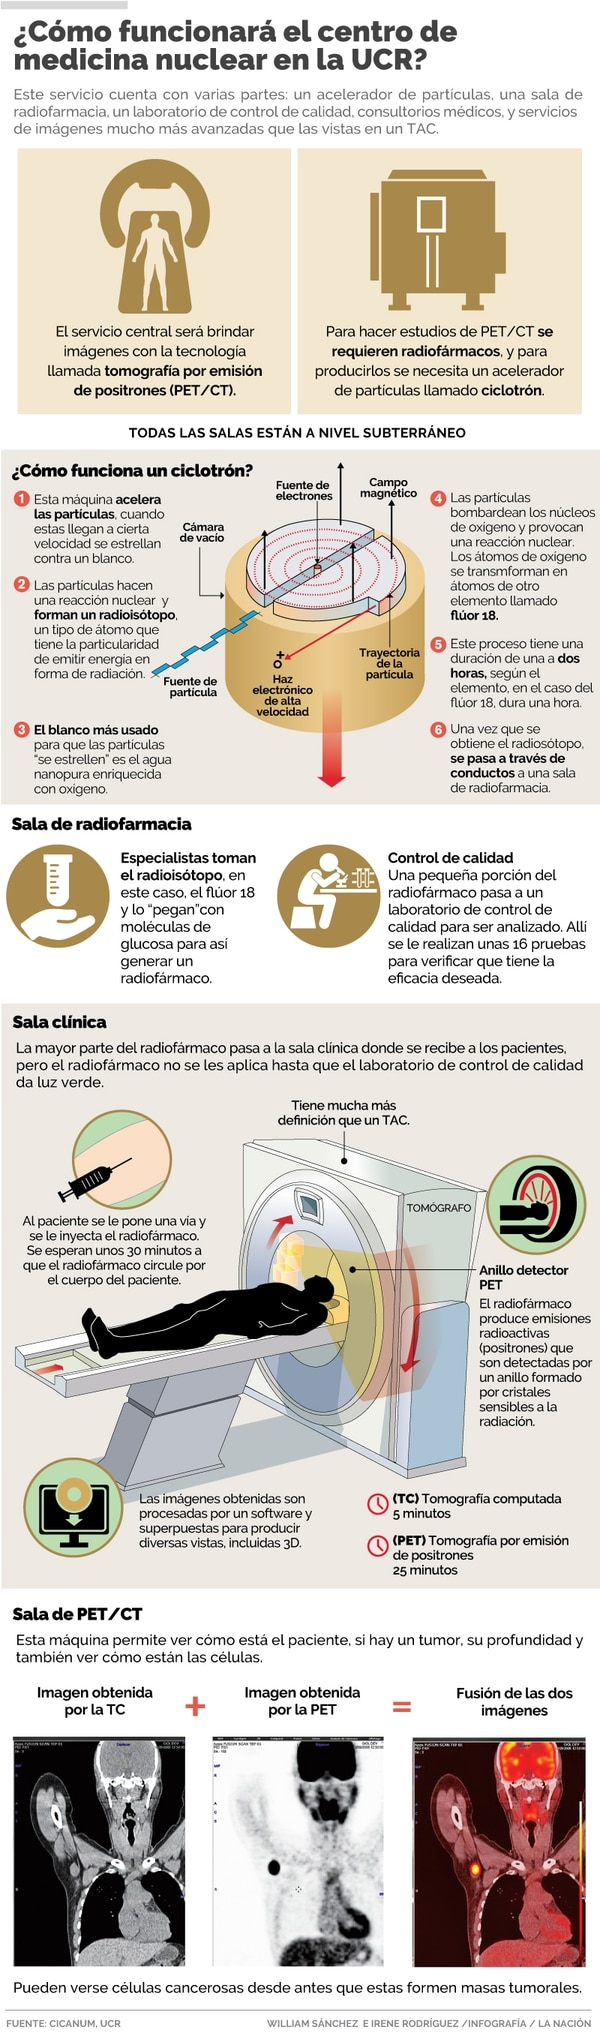 Infografía LN